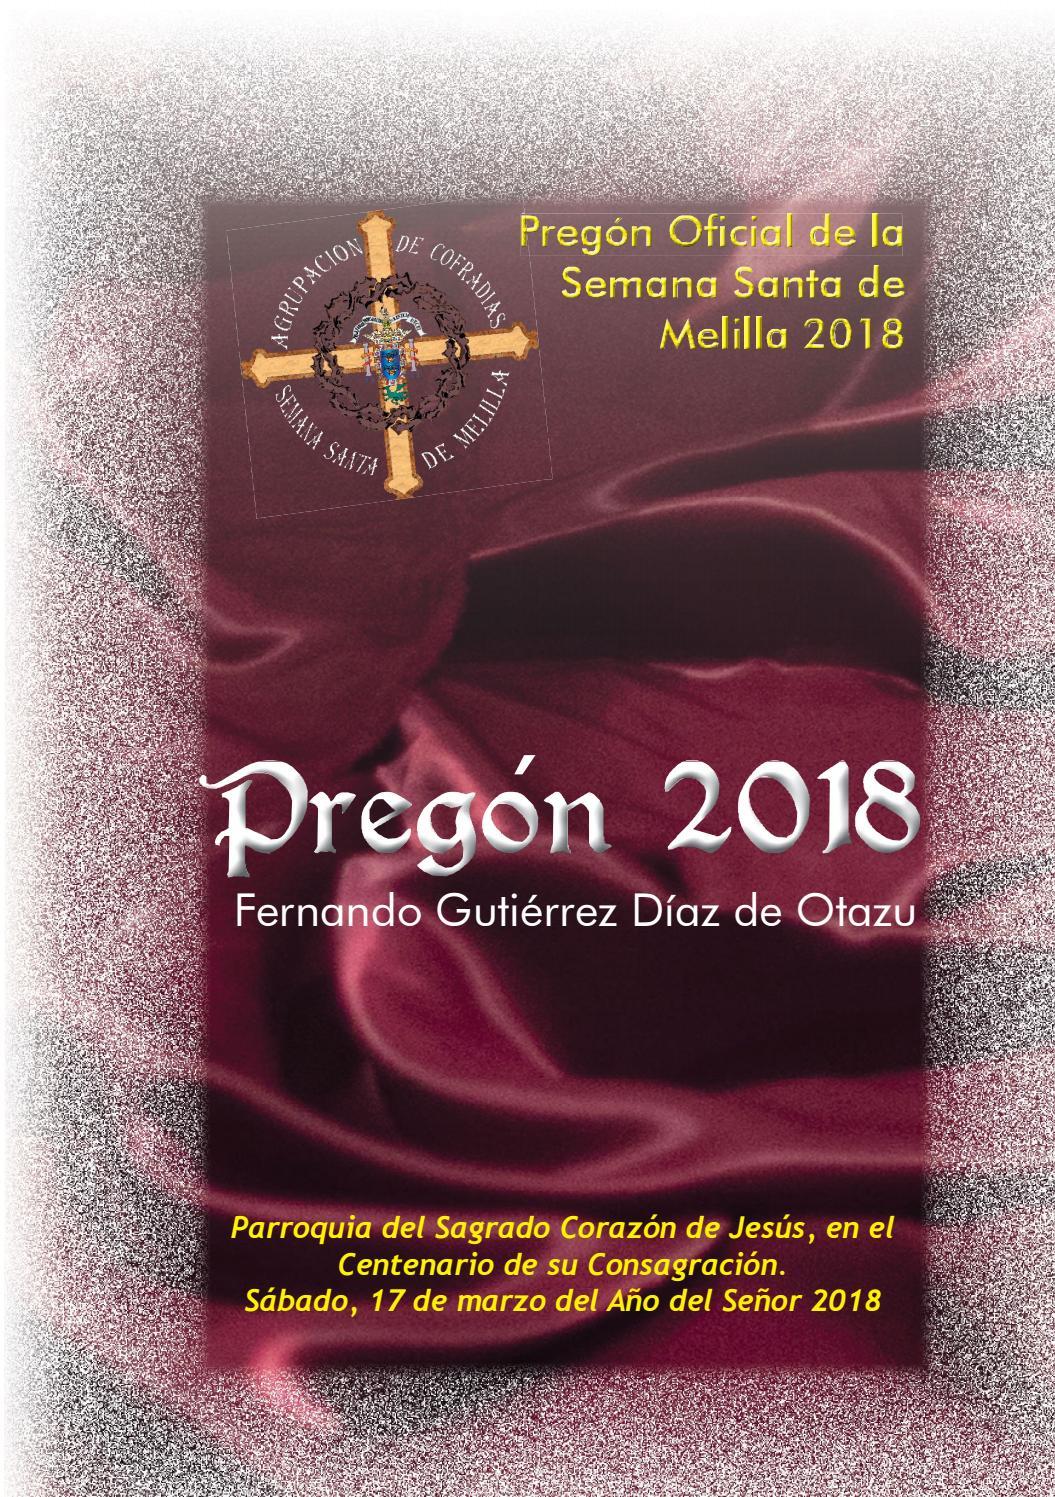 Pregón 2018 by Carlos Rubiales Morales - issuu